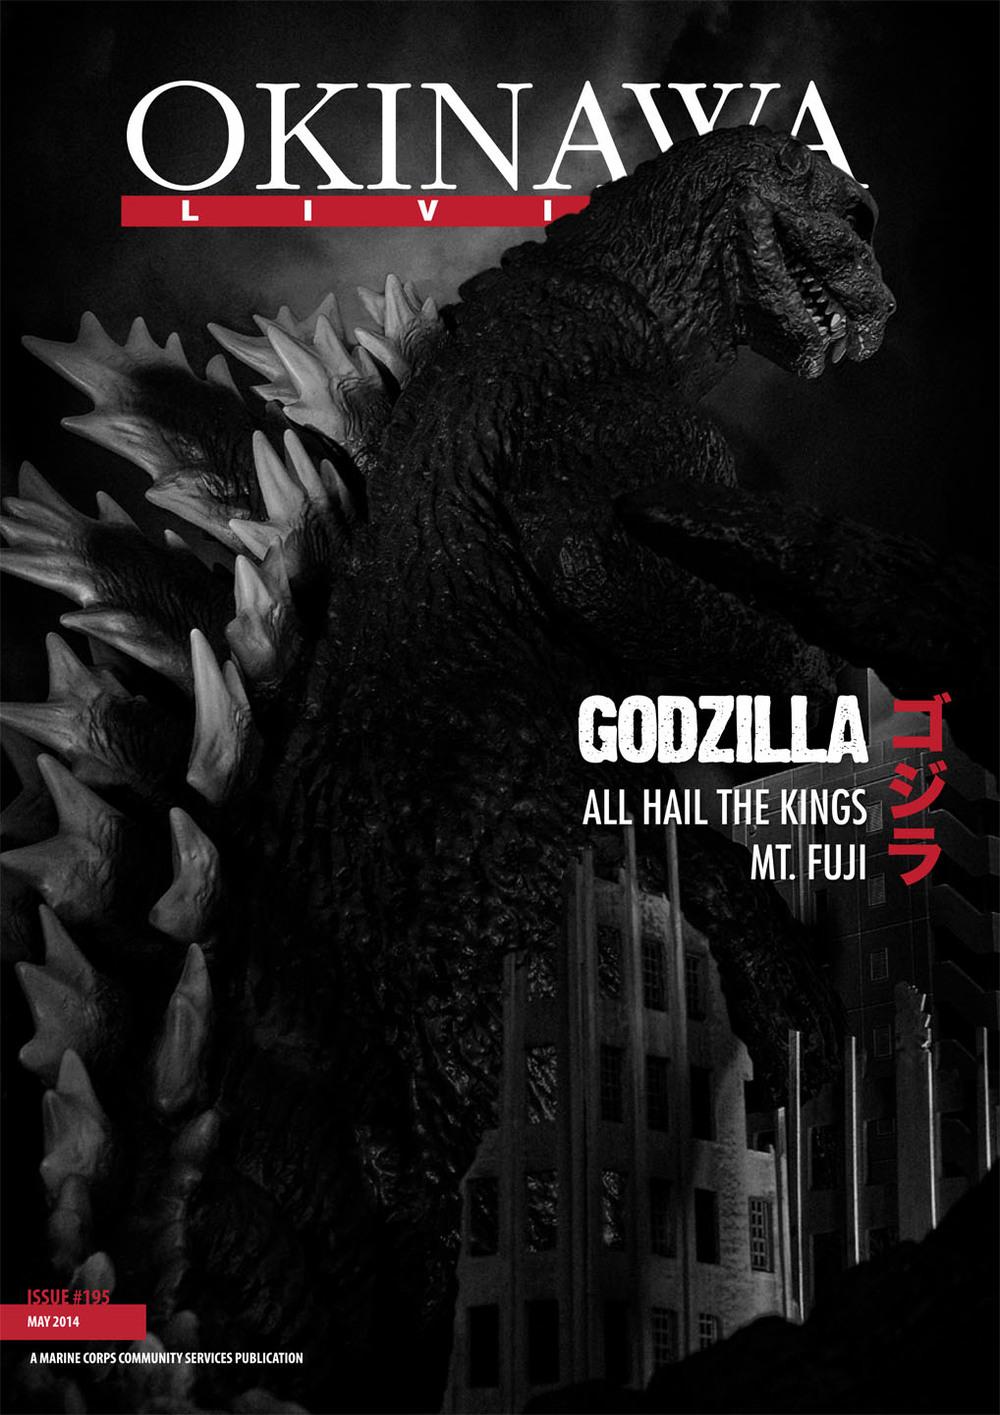 GodzillaMaycover2014.jpg